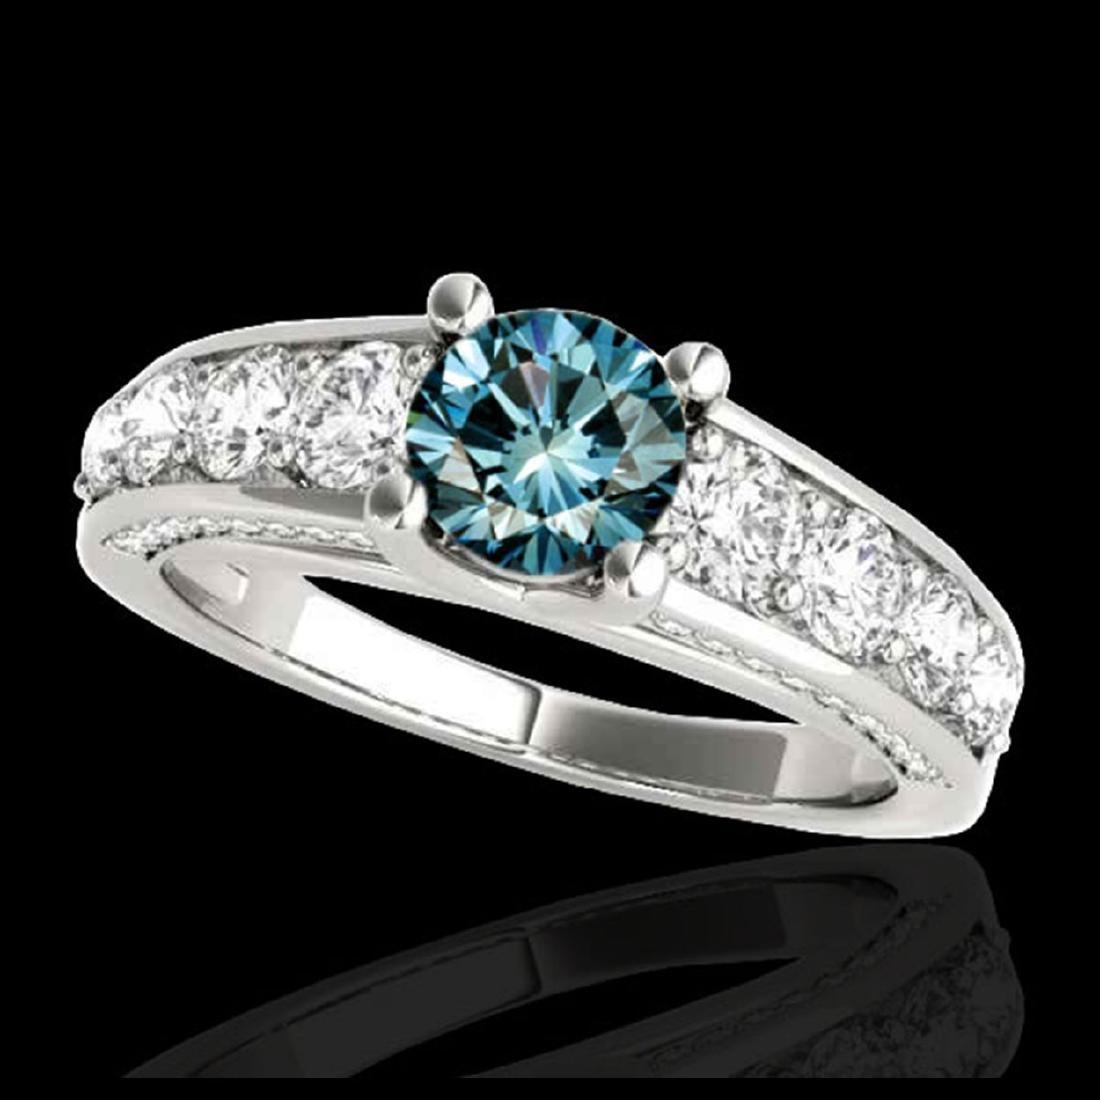 3.05 ctw SI Fancy Blue Diamond Solitaire Ring 10K White